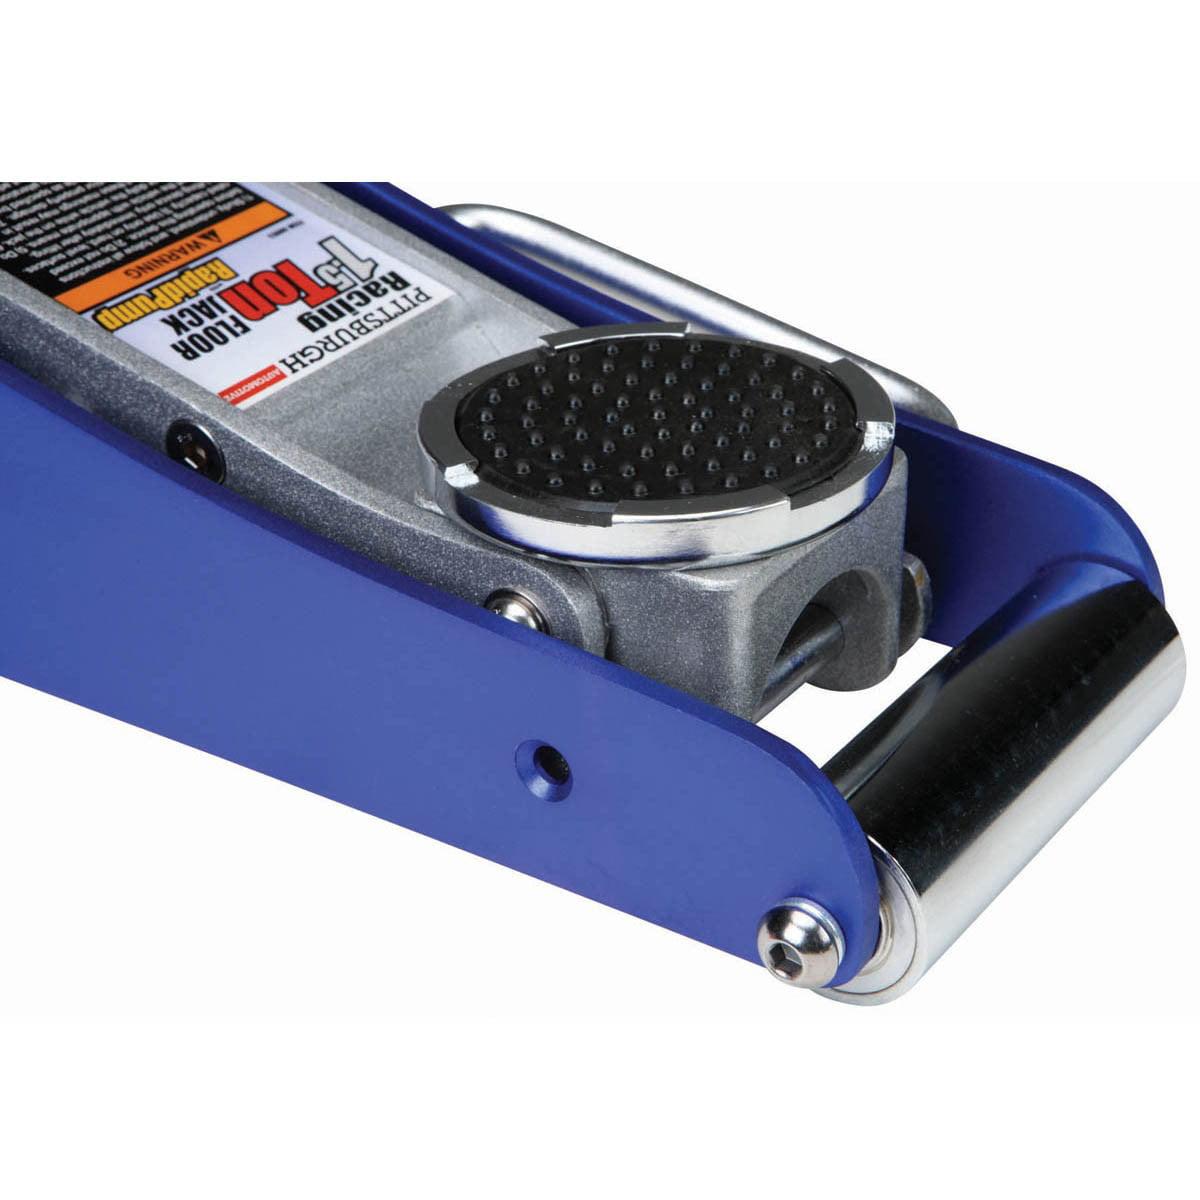 Pittsburgh Floor Jack 1 5 Ton Aluminum Racing Rapid 3 1 2 Pump Adjustable 60569 Walmart Com Walmart Com